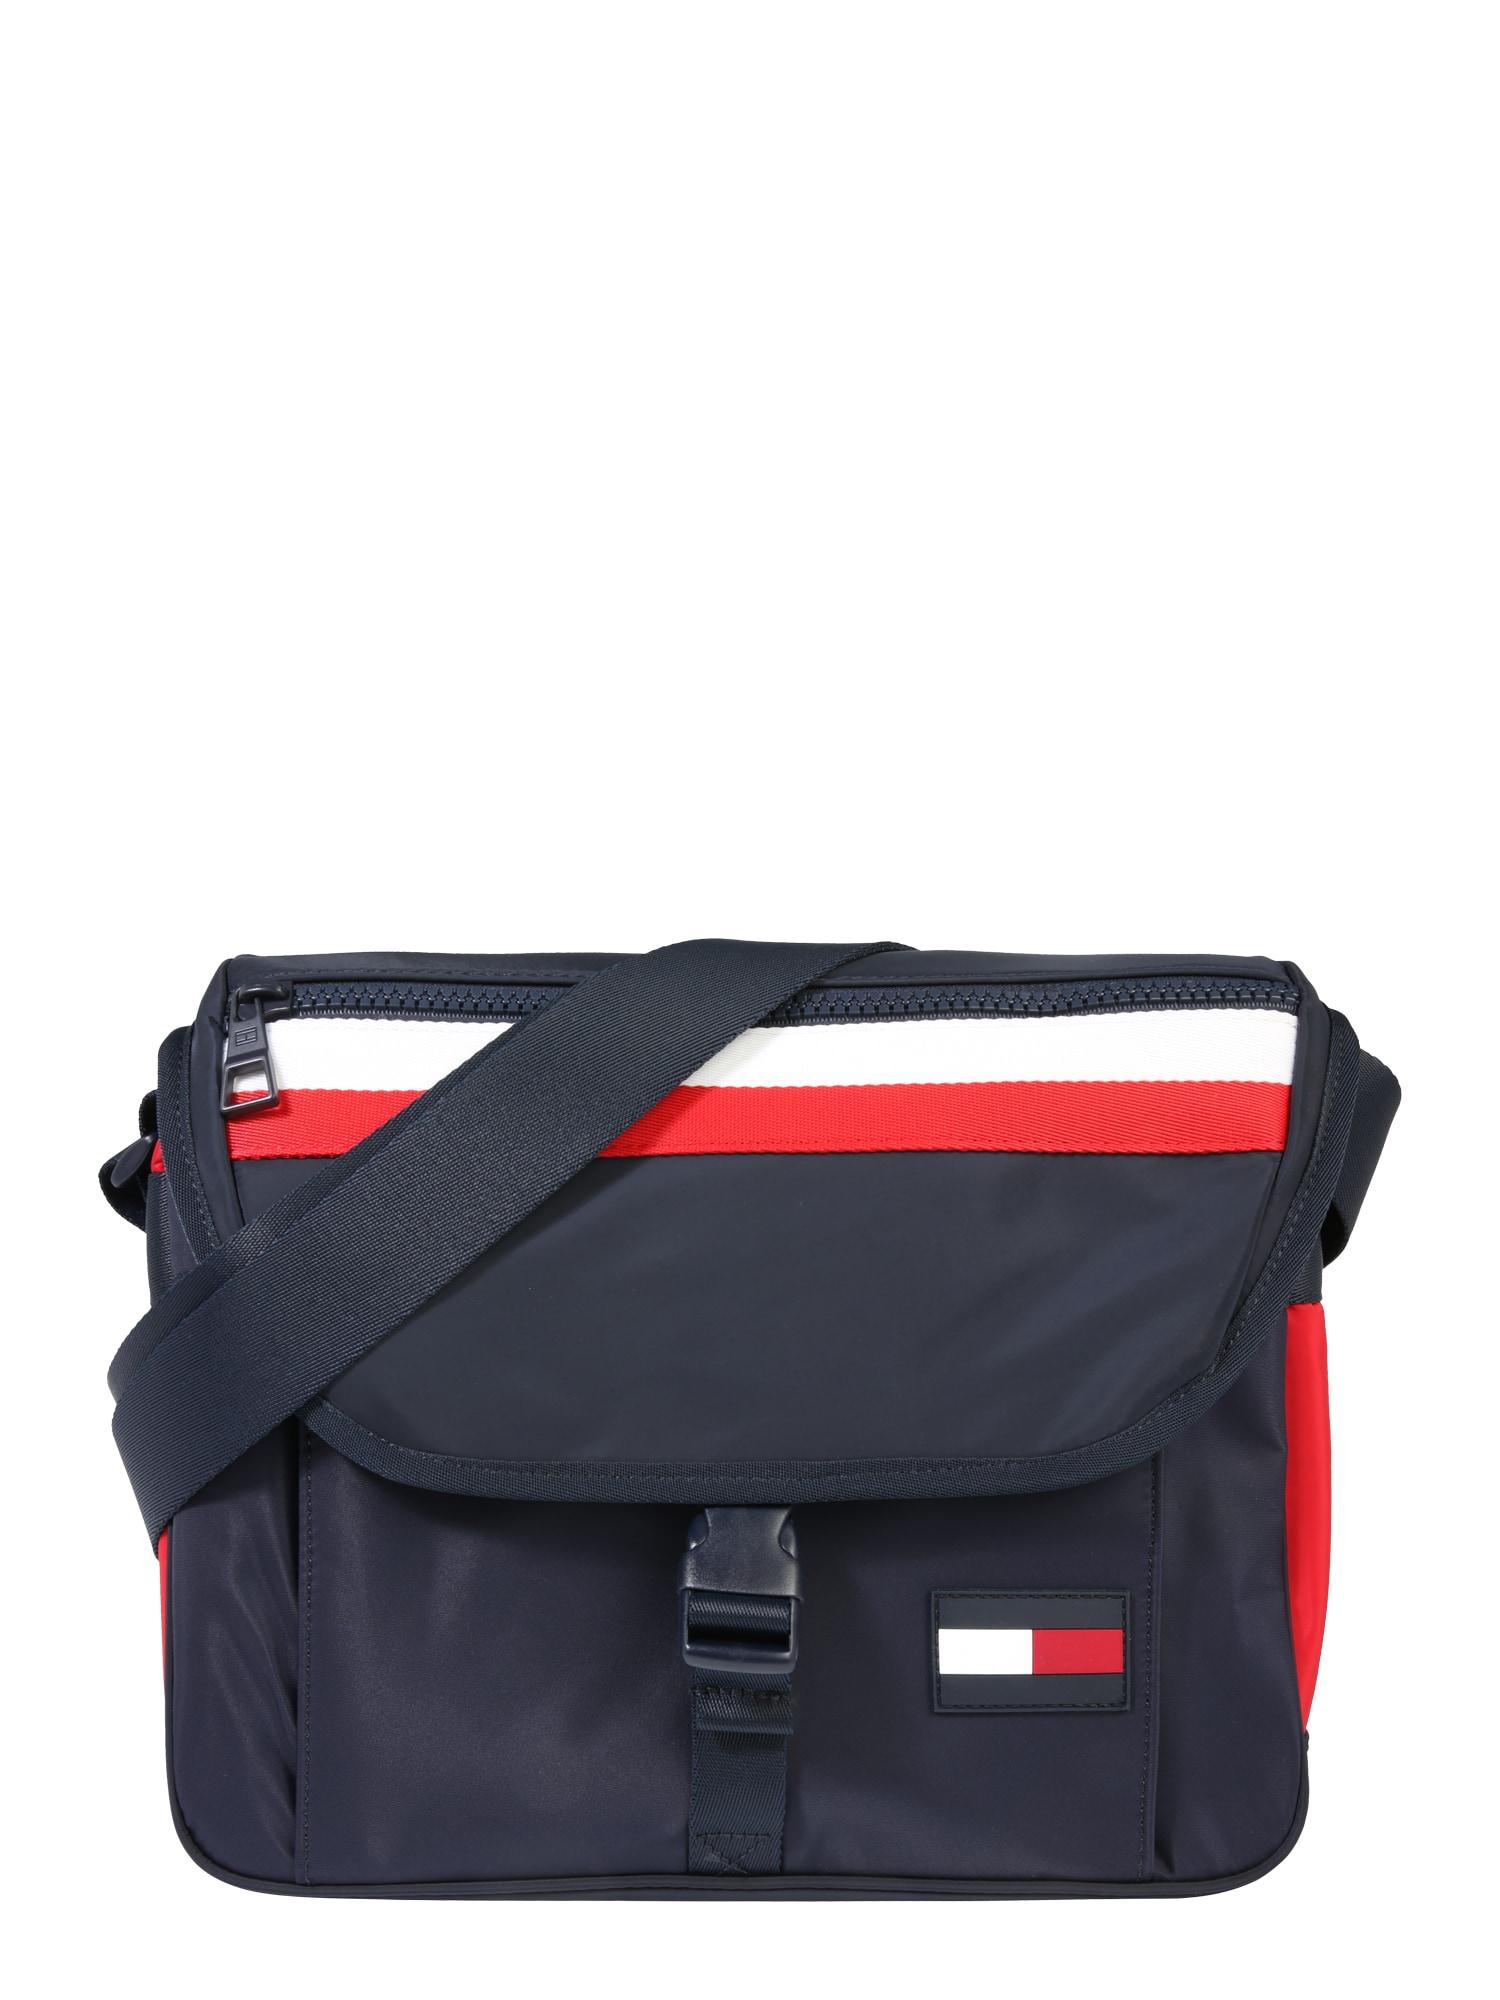 "TOMMY HILFIGER ""Messenger"" stiliaus rankinė 'Sport Mix Corp' tamsiai mėlyna / raudona / balta"